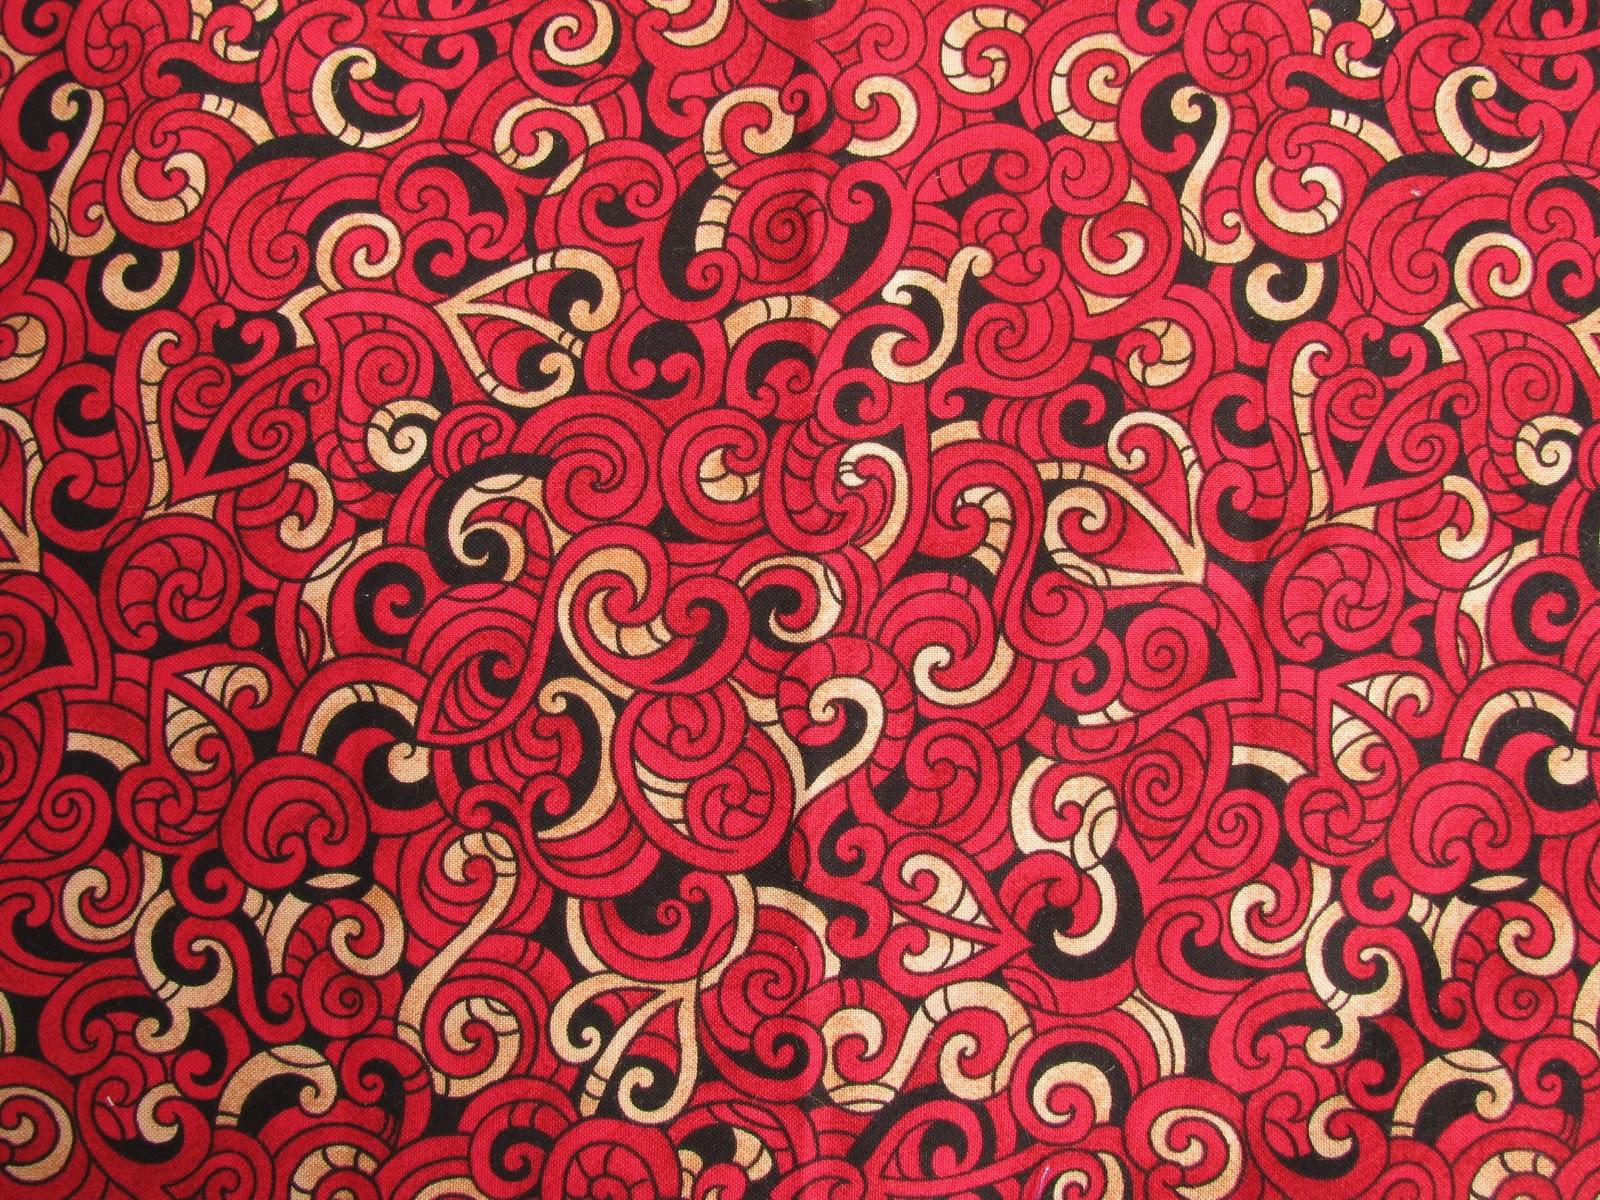 maori art iphone wallpaper - photo #15